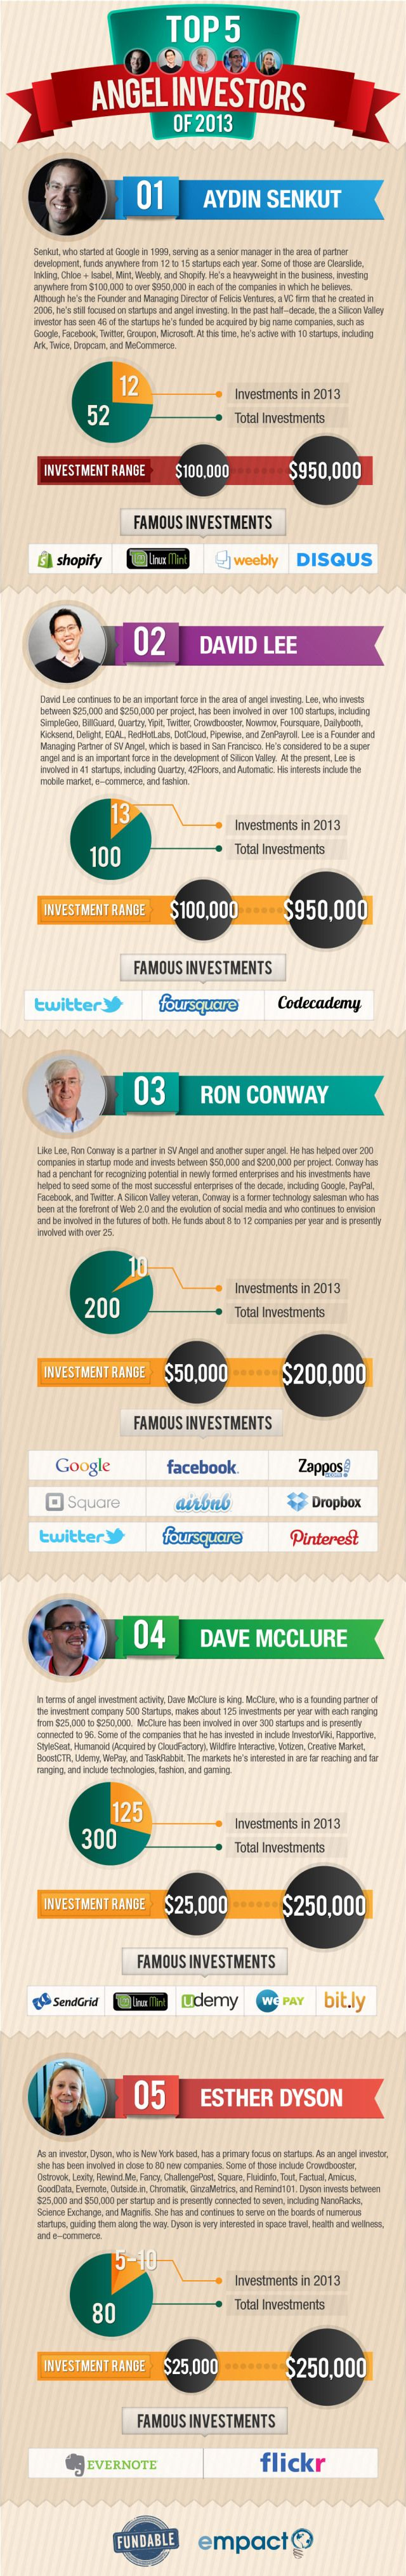 Top 5 angel investors of 2013 http://www.manhattanstreetcapital.com/